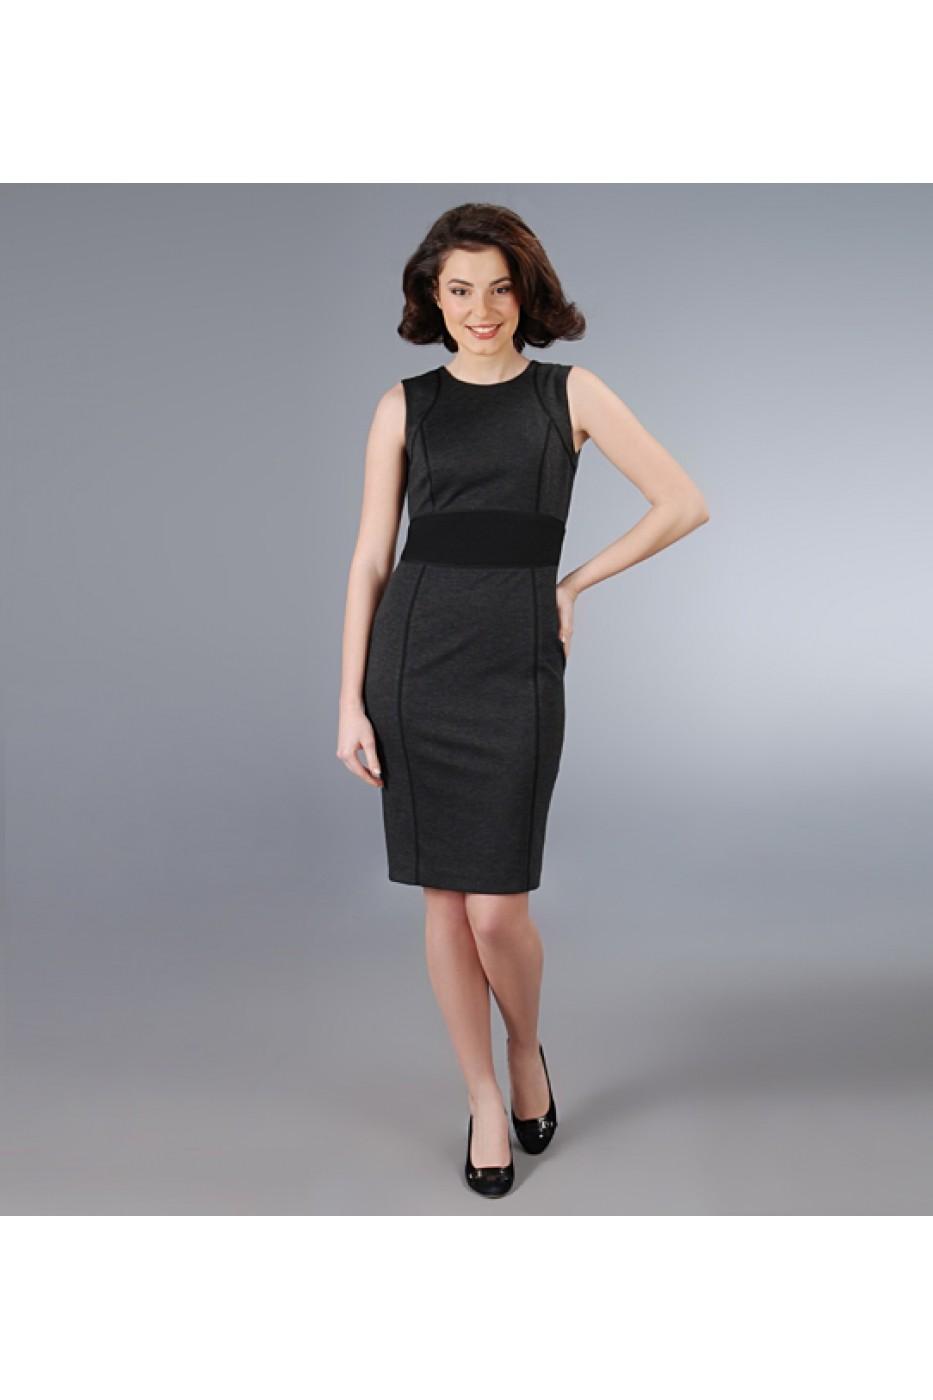 Rochie Yokko Din Stofa Elastica Gri Cu Cordon Negru Negru Fashionup